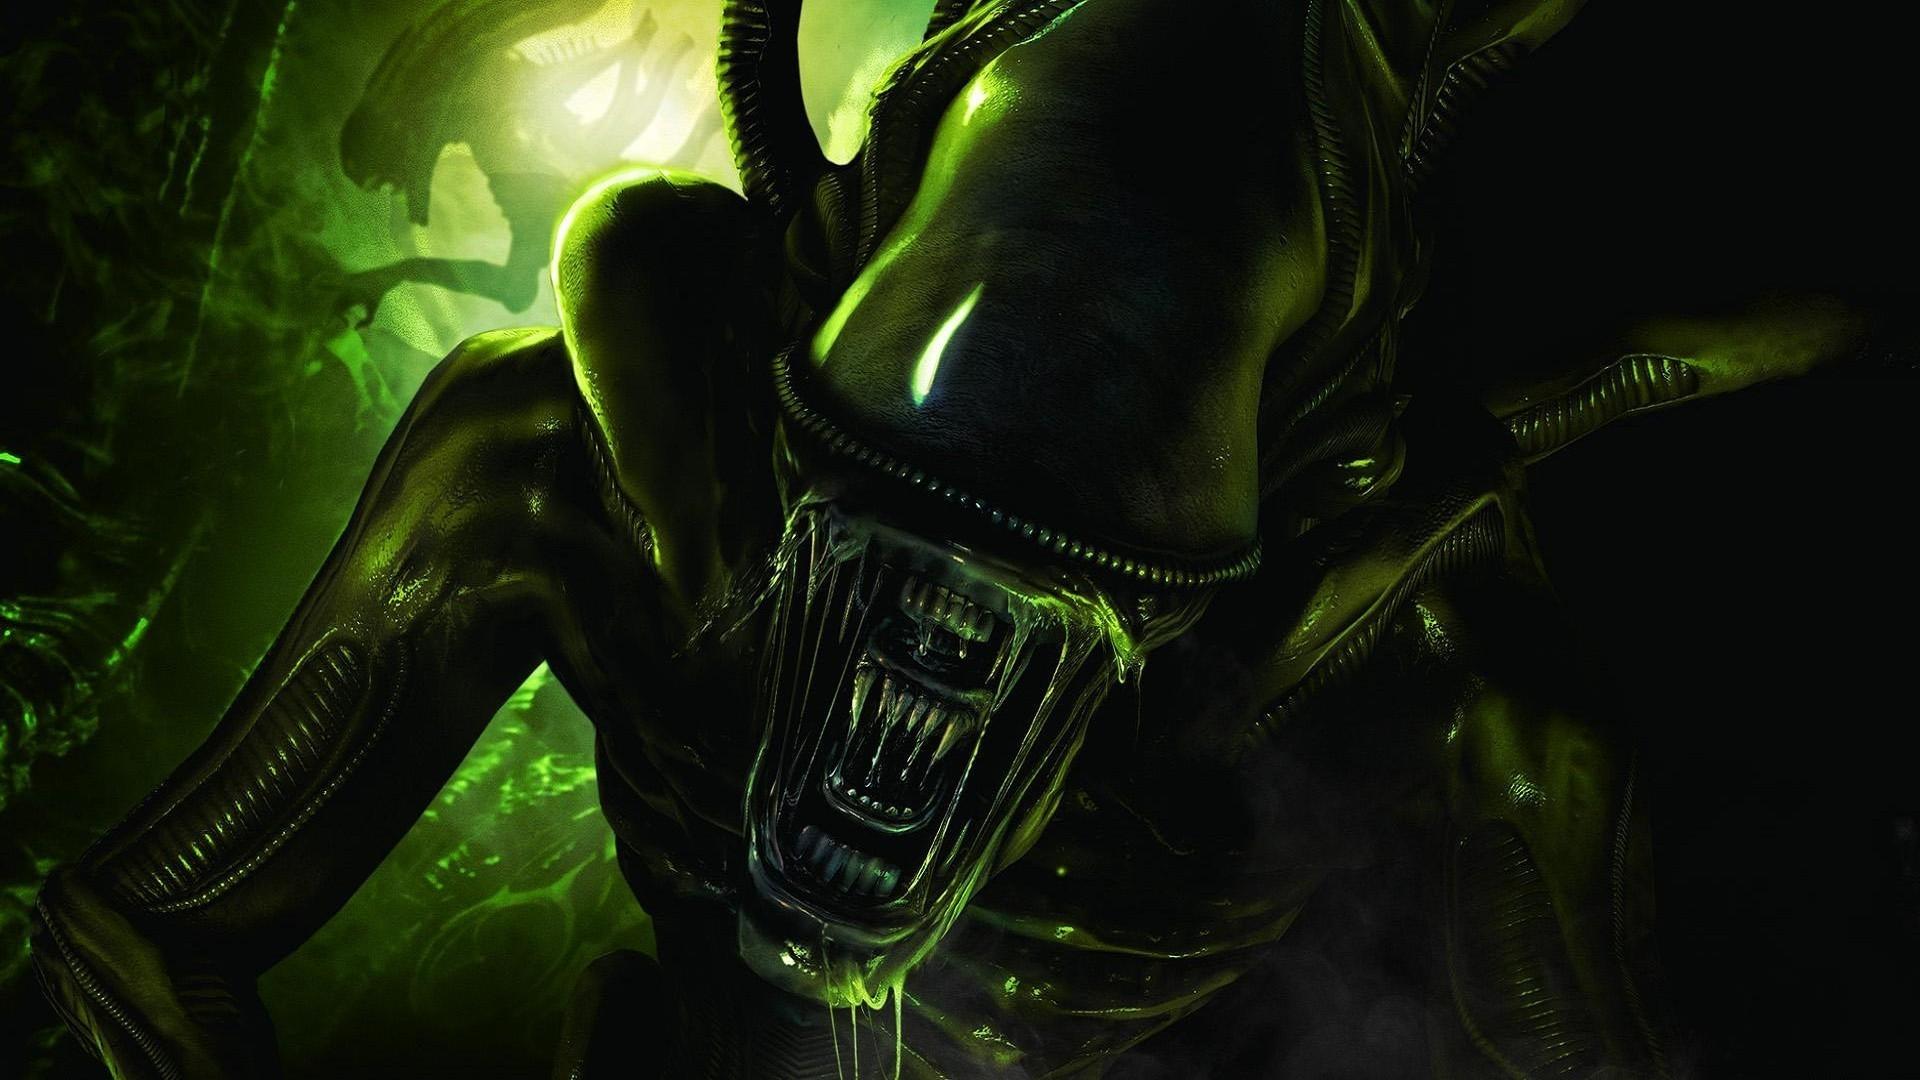 Awesome Alien Wallpaper Hd Screensaver | cute Wallpapers